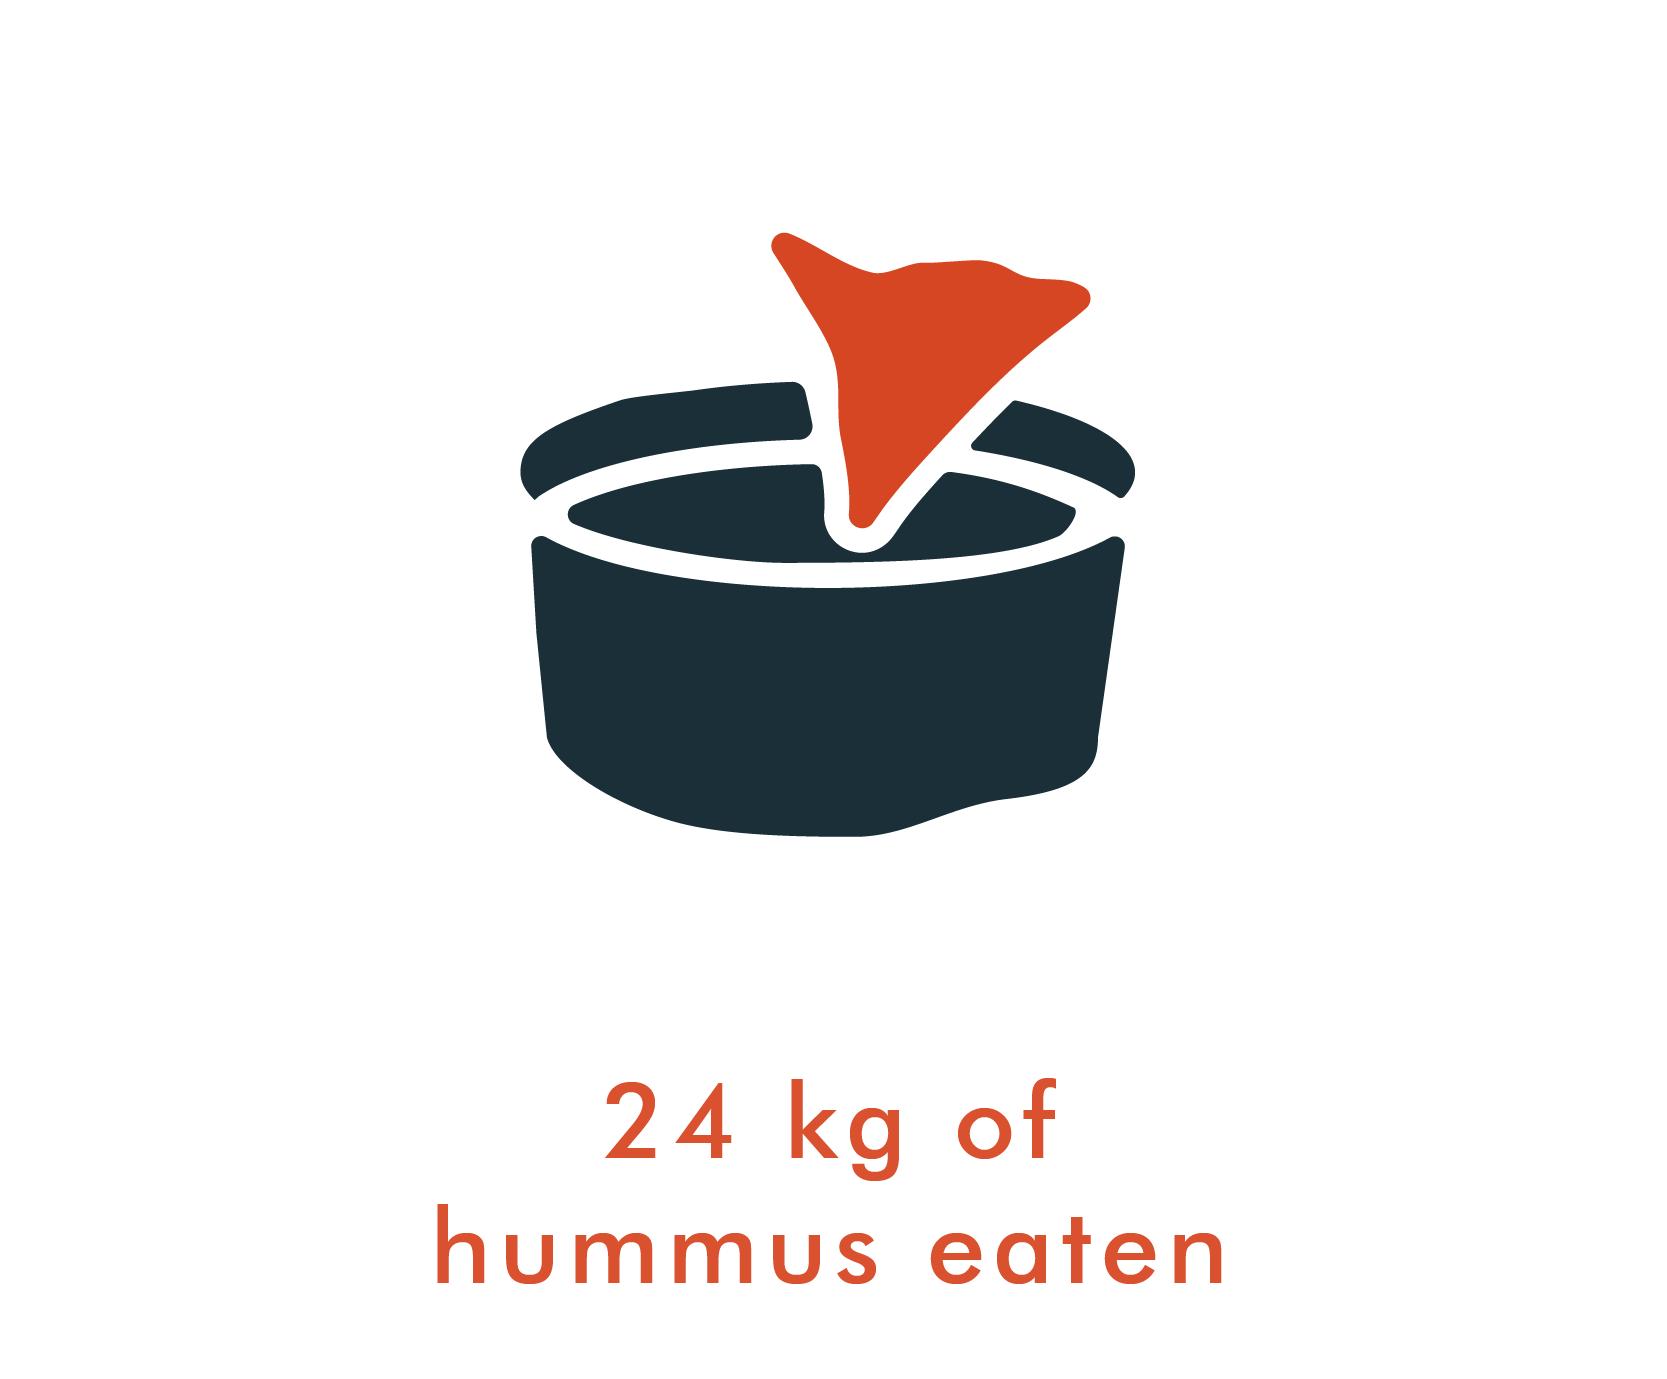 hummus-def.png